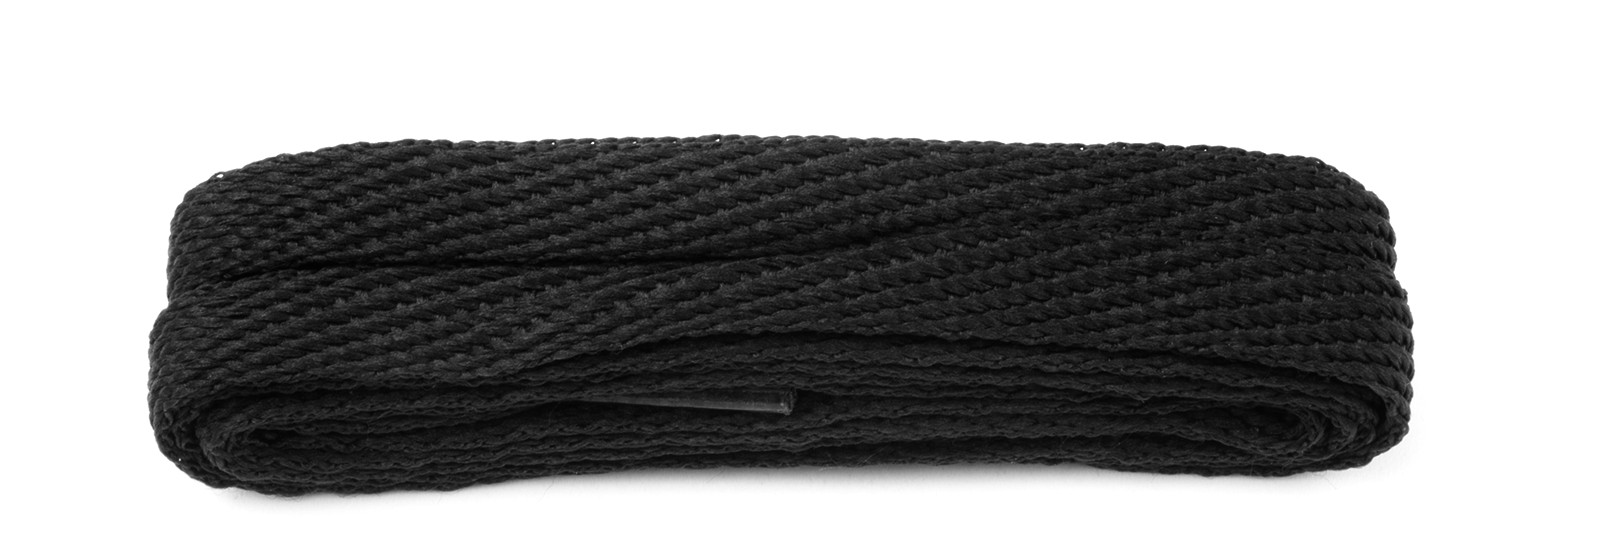 Black 120cm American Flat 10mm Banded